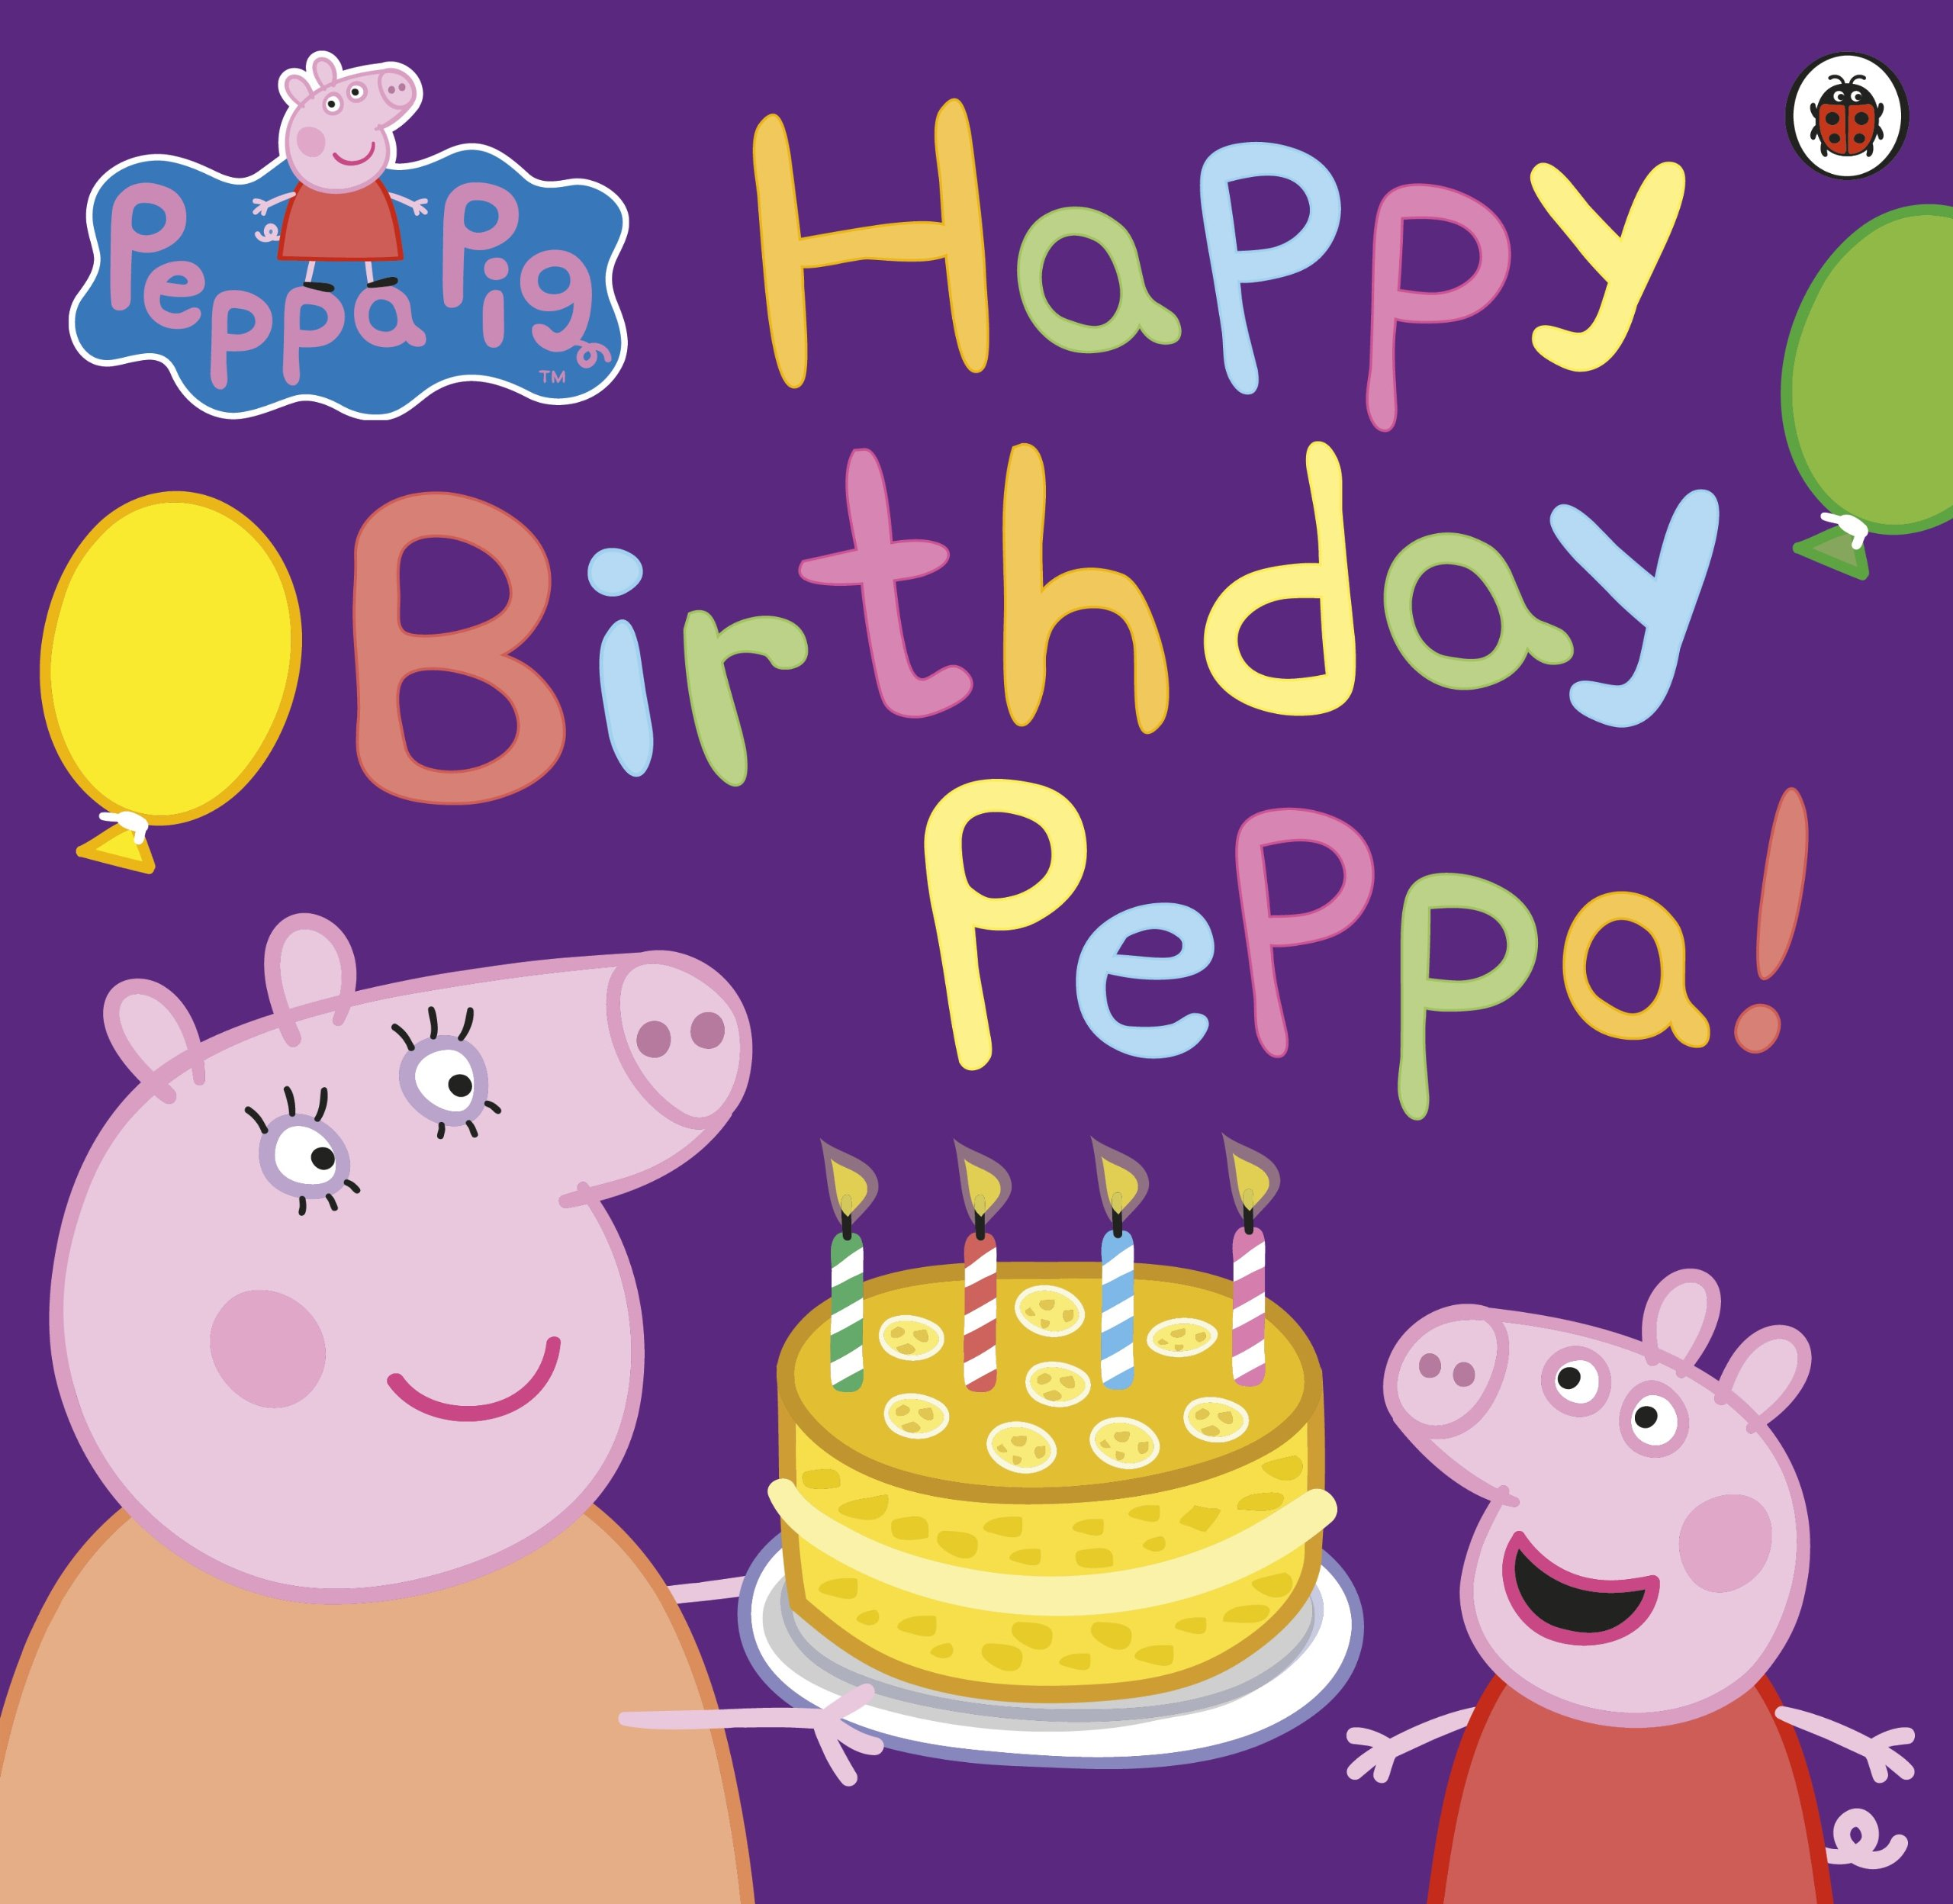 amazon peppa pig happy birthday peppa pigs